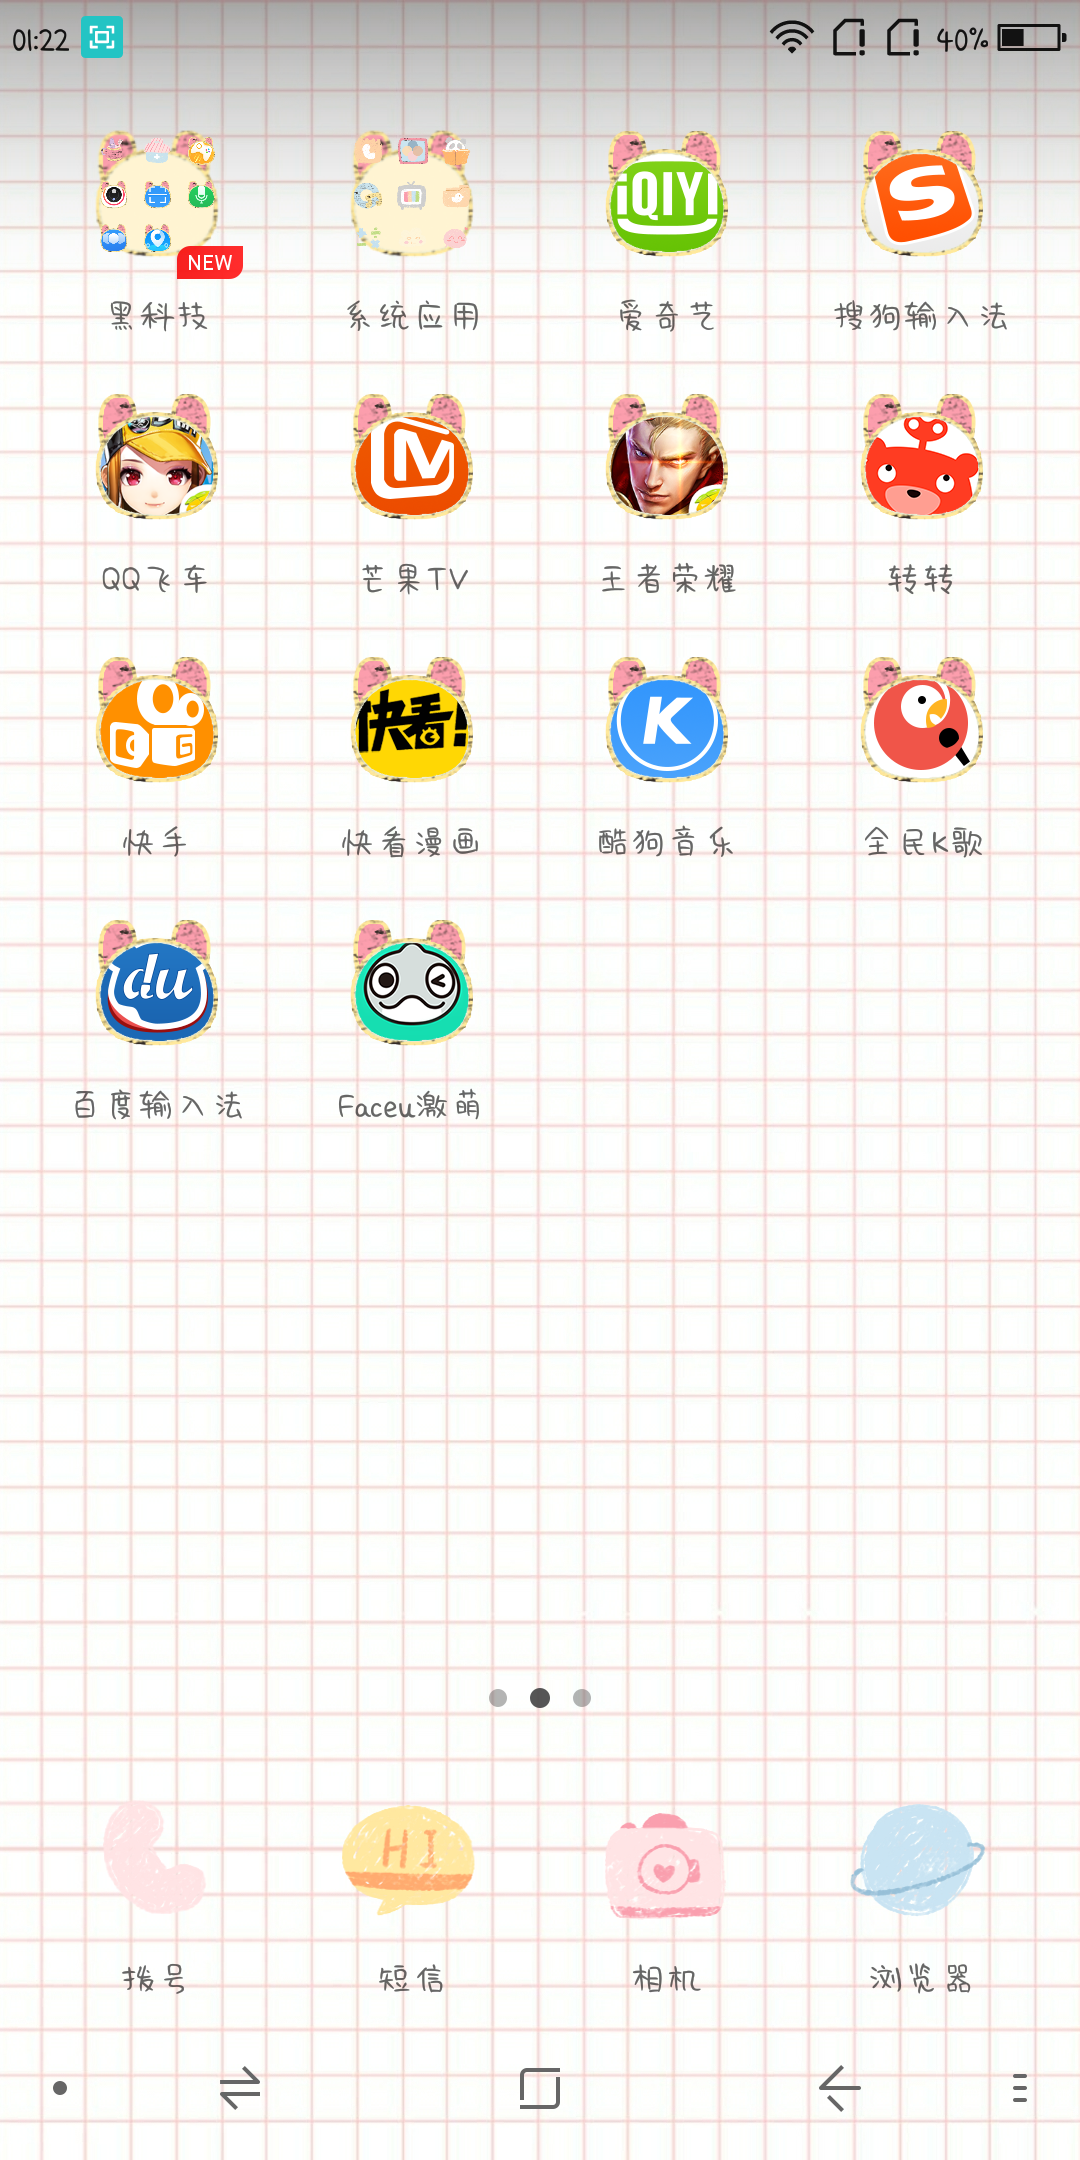 Screenshot_2018-01-28-01-22-50.png